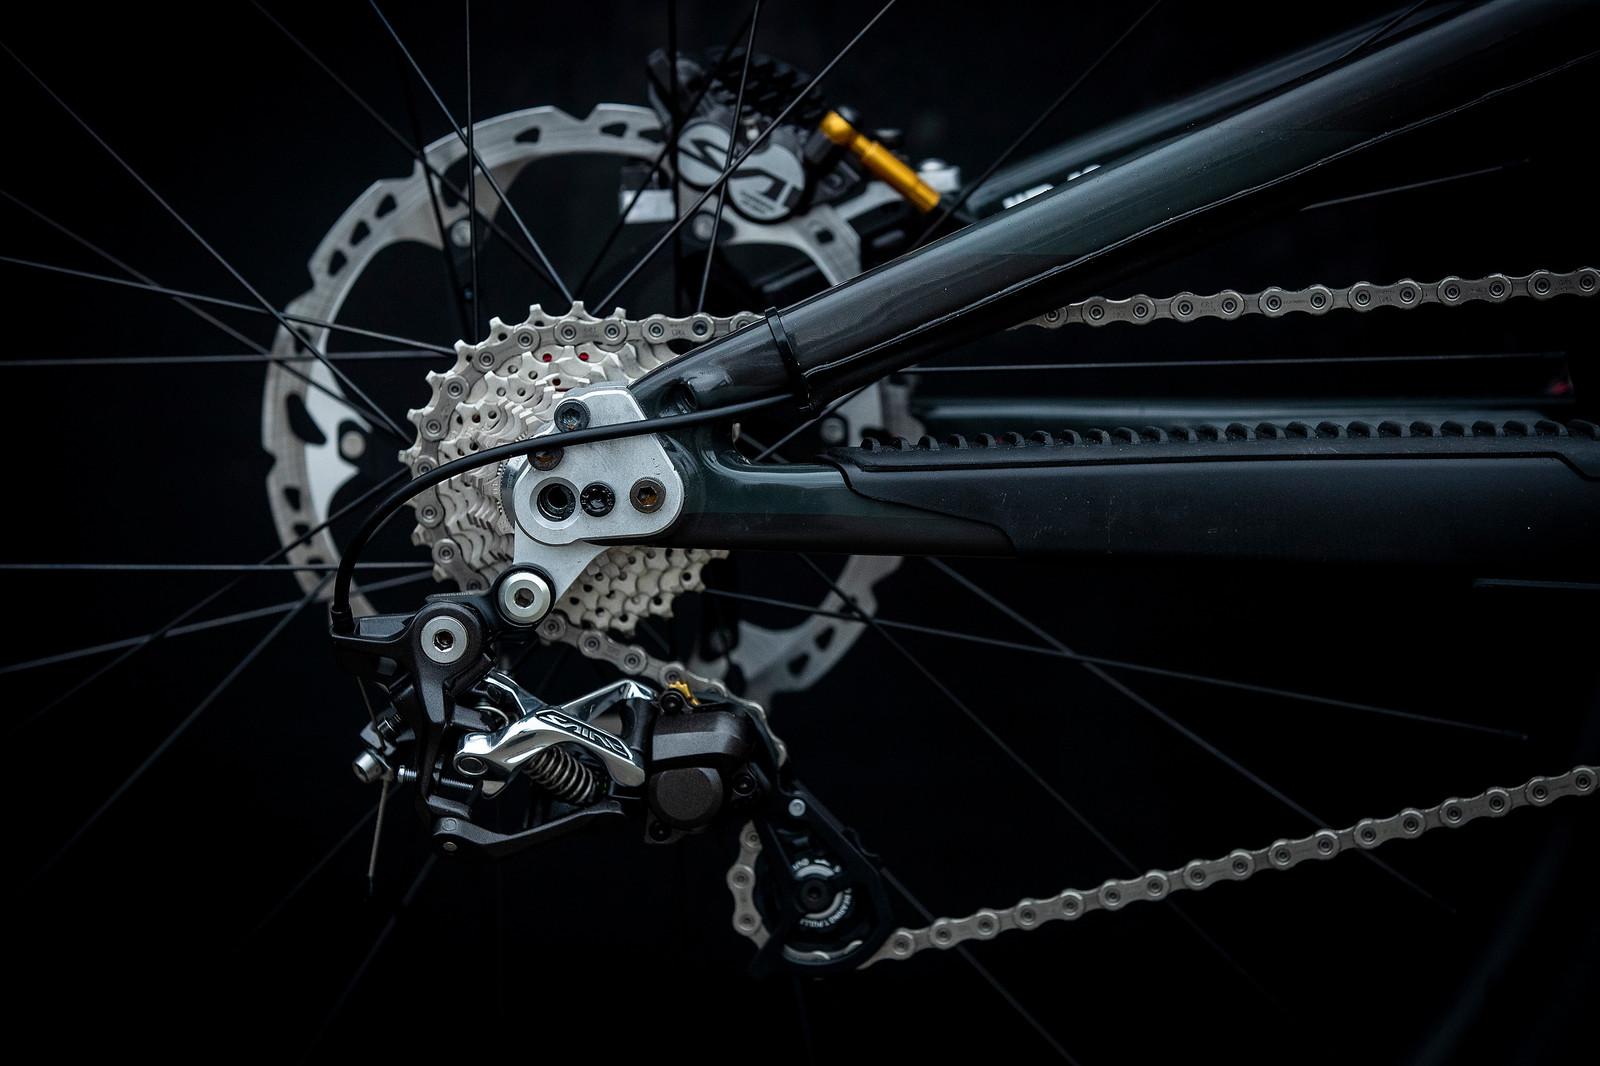 Greg's Prototype Long Rear End - Santa Cruz Syndicate 2019 World Championships Race Bikes - Mountain Biking Pictures - Vital MTB